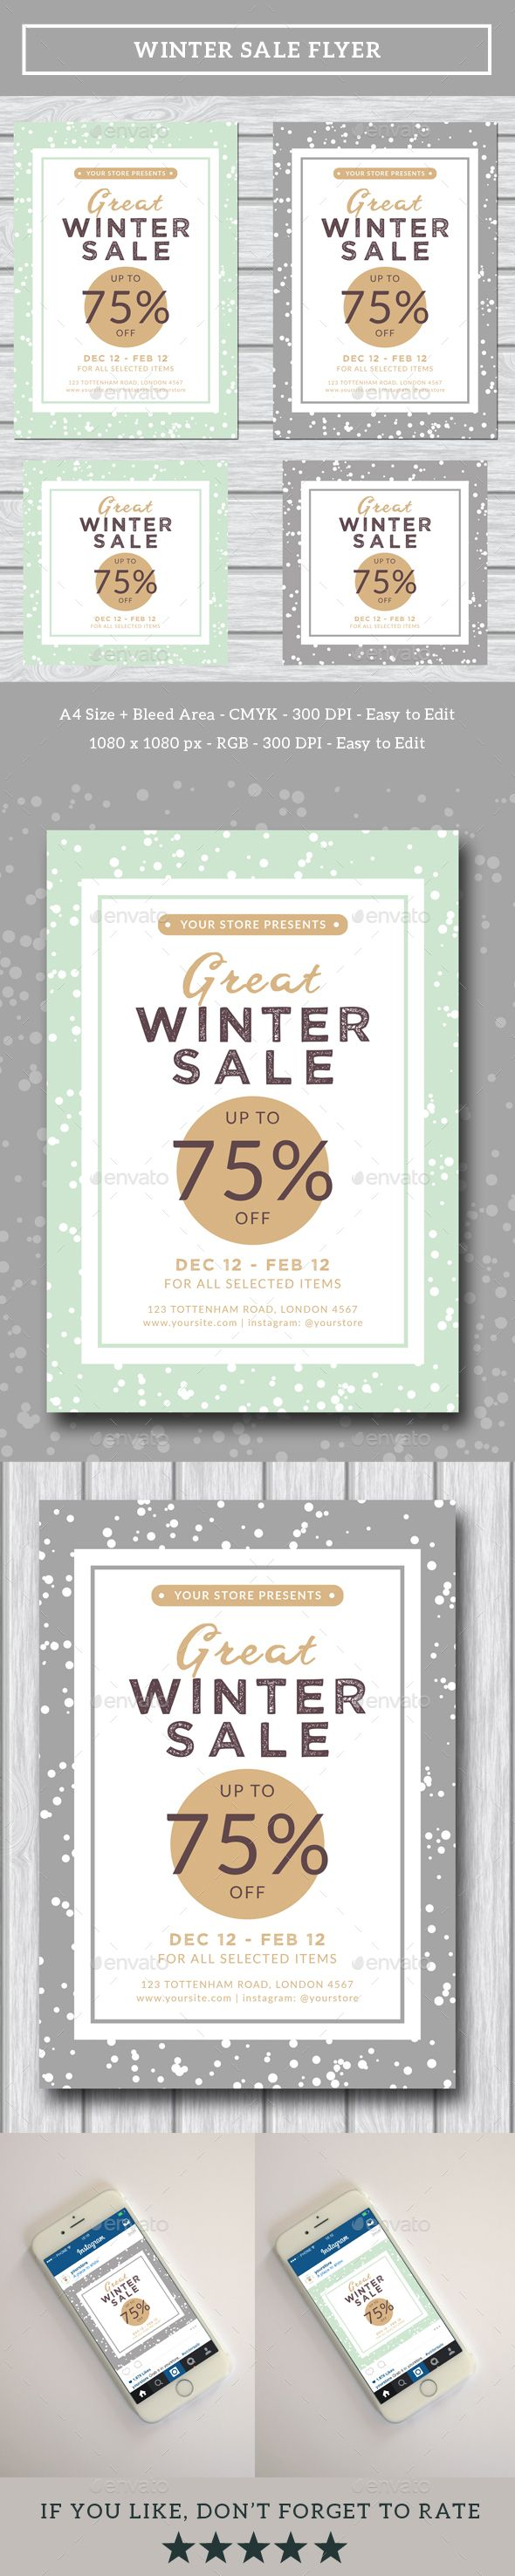 Winter Sale Flyer + Instagram Banner — Photoshop PSD #snow #winter sale flyer • Download ➝ https://graphicriver.net/item/winter-sale-flyer-instagram-banner/19198409?ref=pxcr